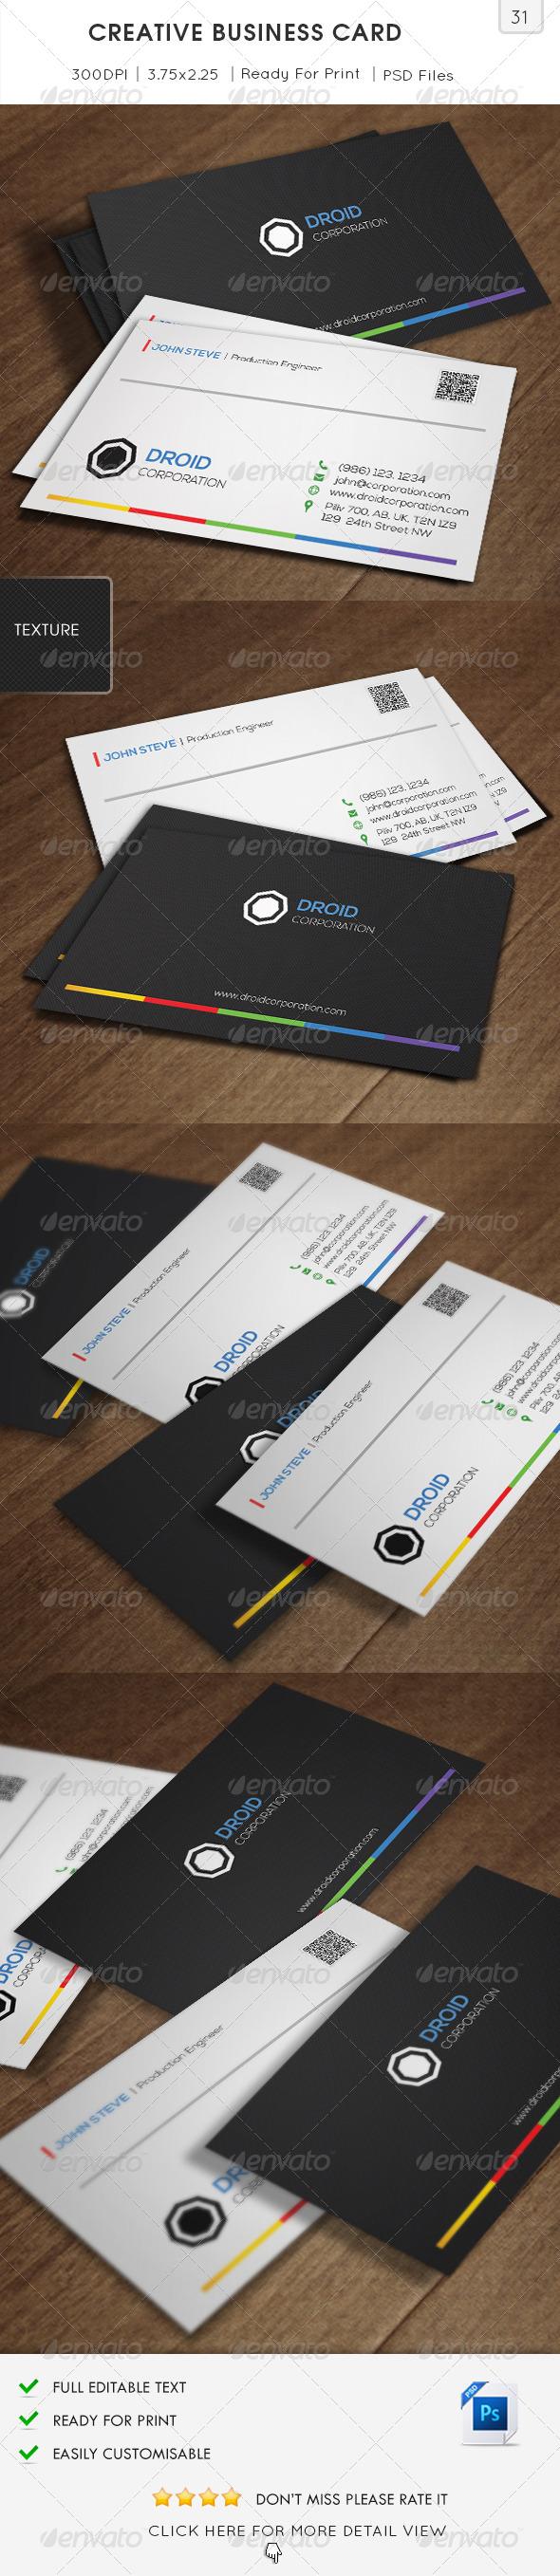 Creative Business Card v31 - Creative Business Cards